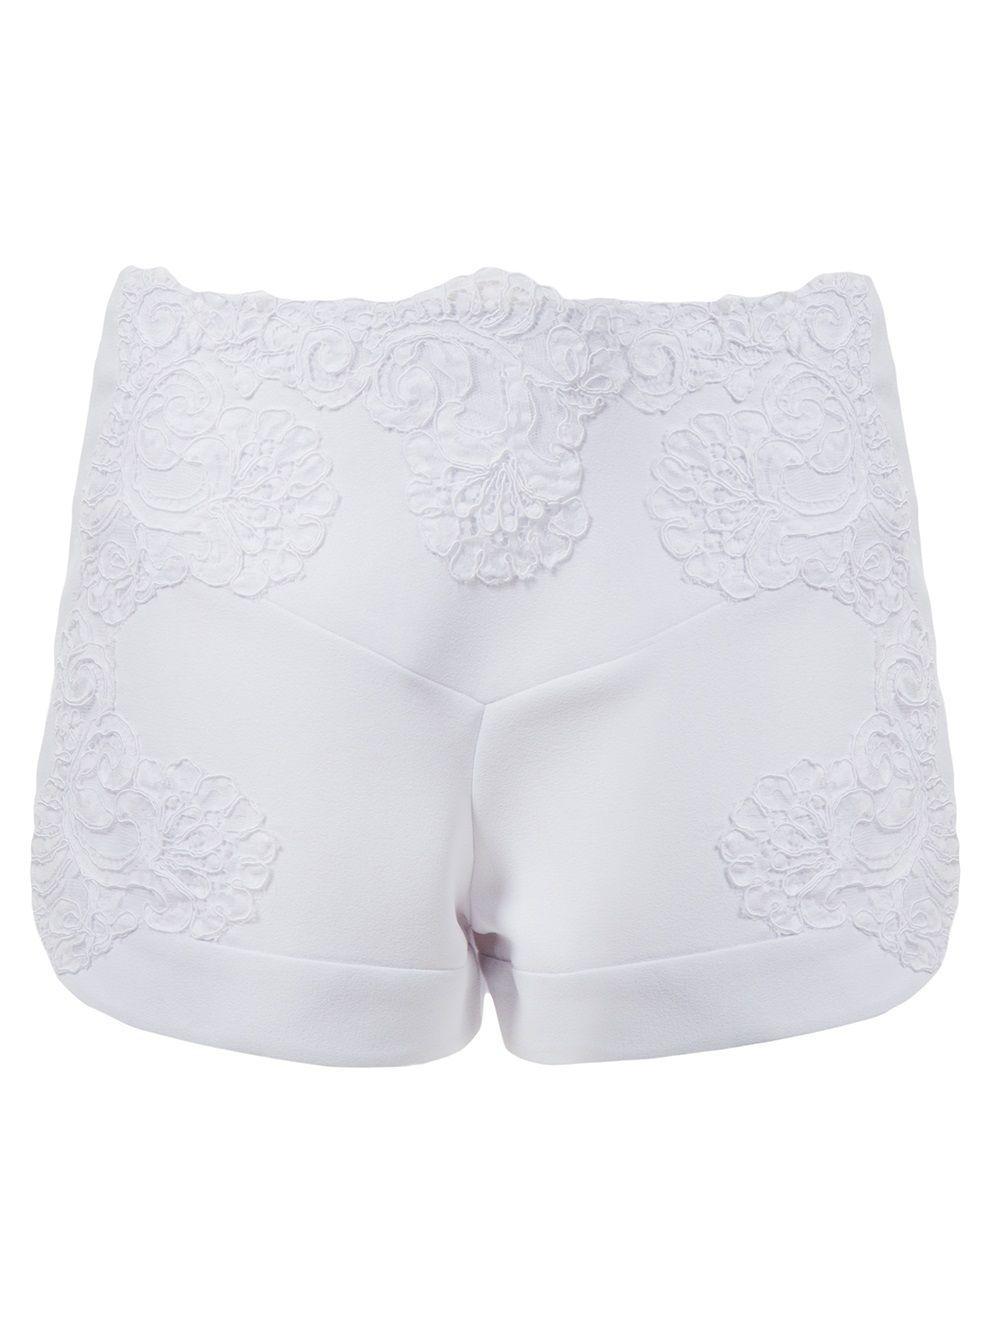 Martha Medeiros Shorts Branco